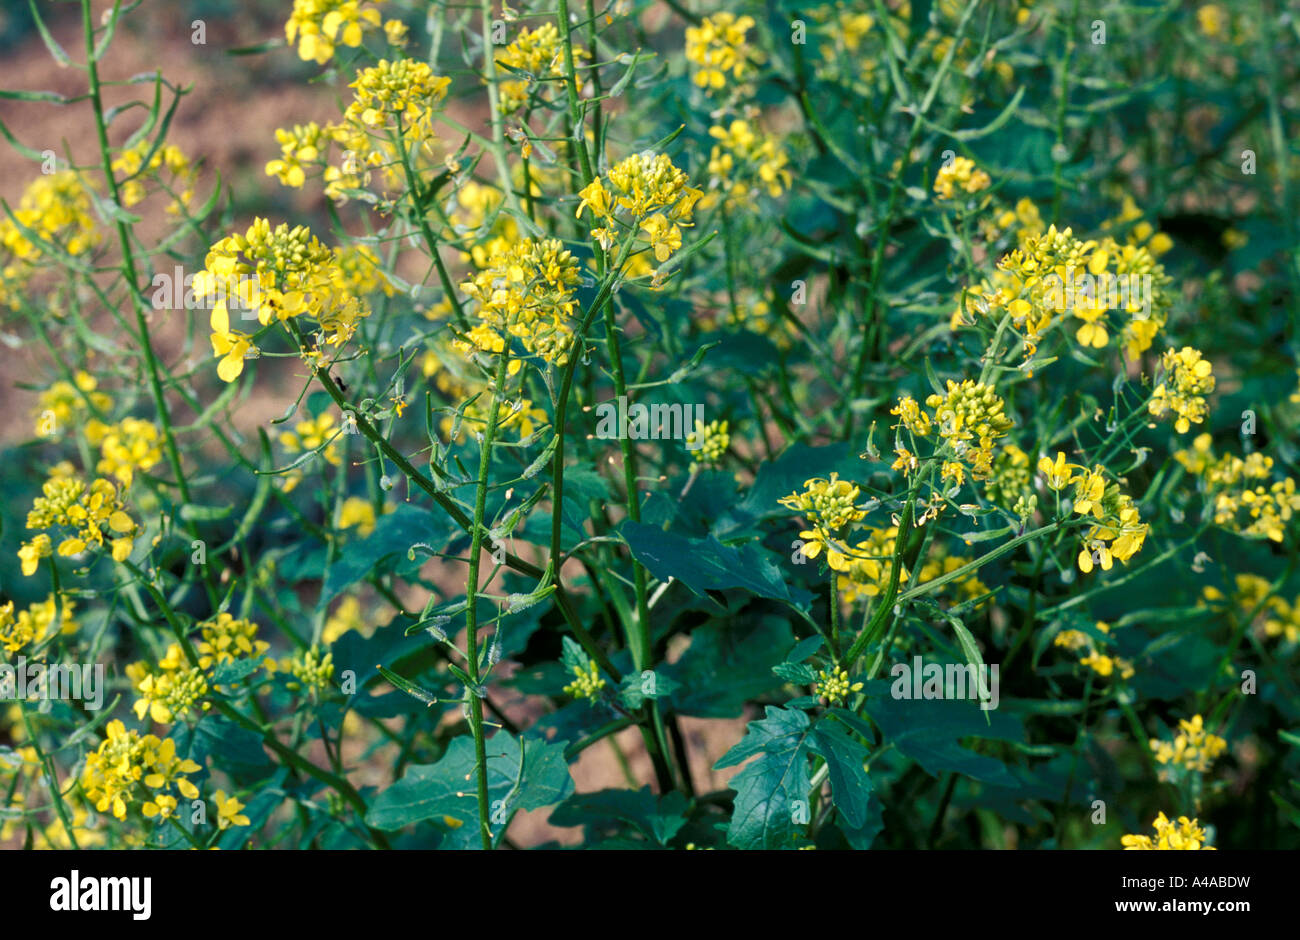 Brassica Hirta - Stock Image